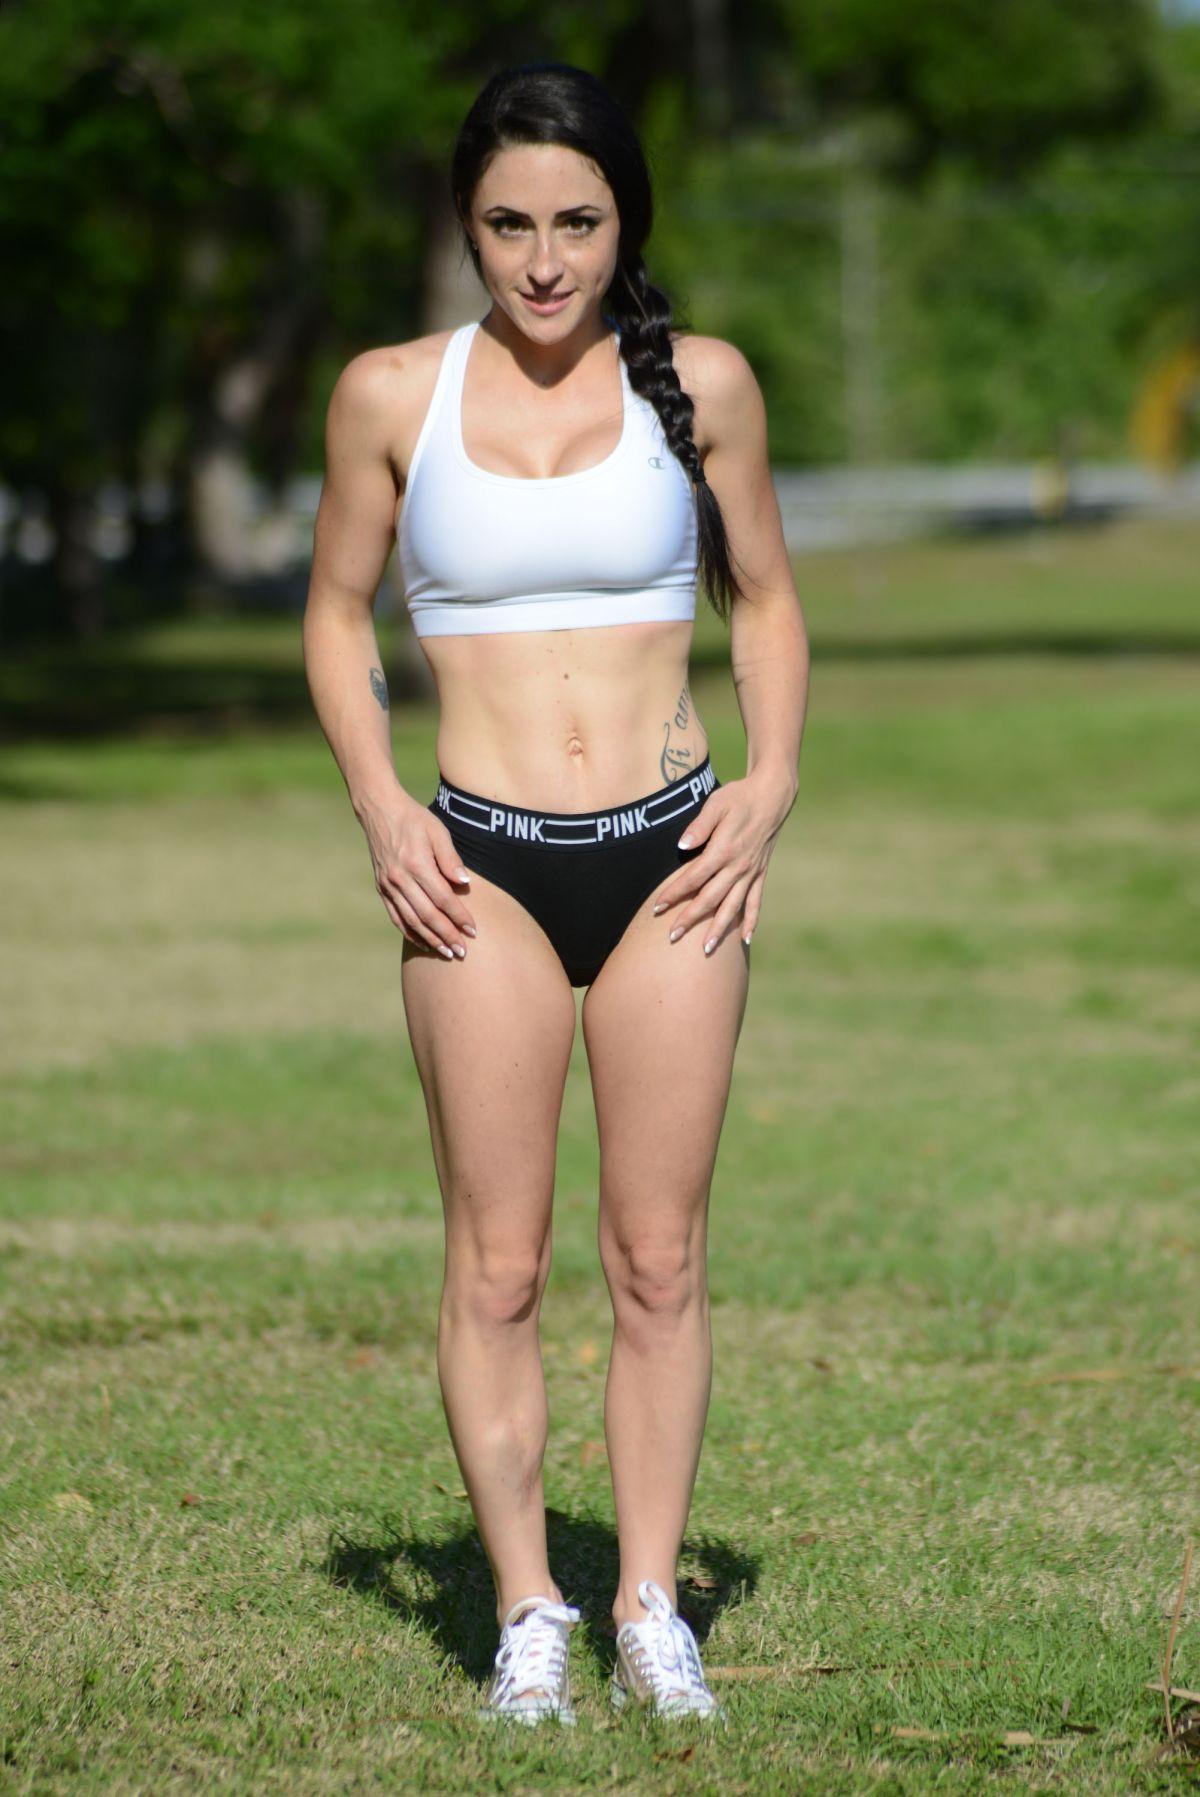 2019 Carmen Valentina nude photos 2019